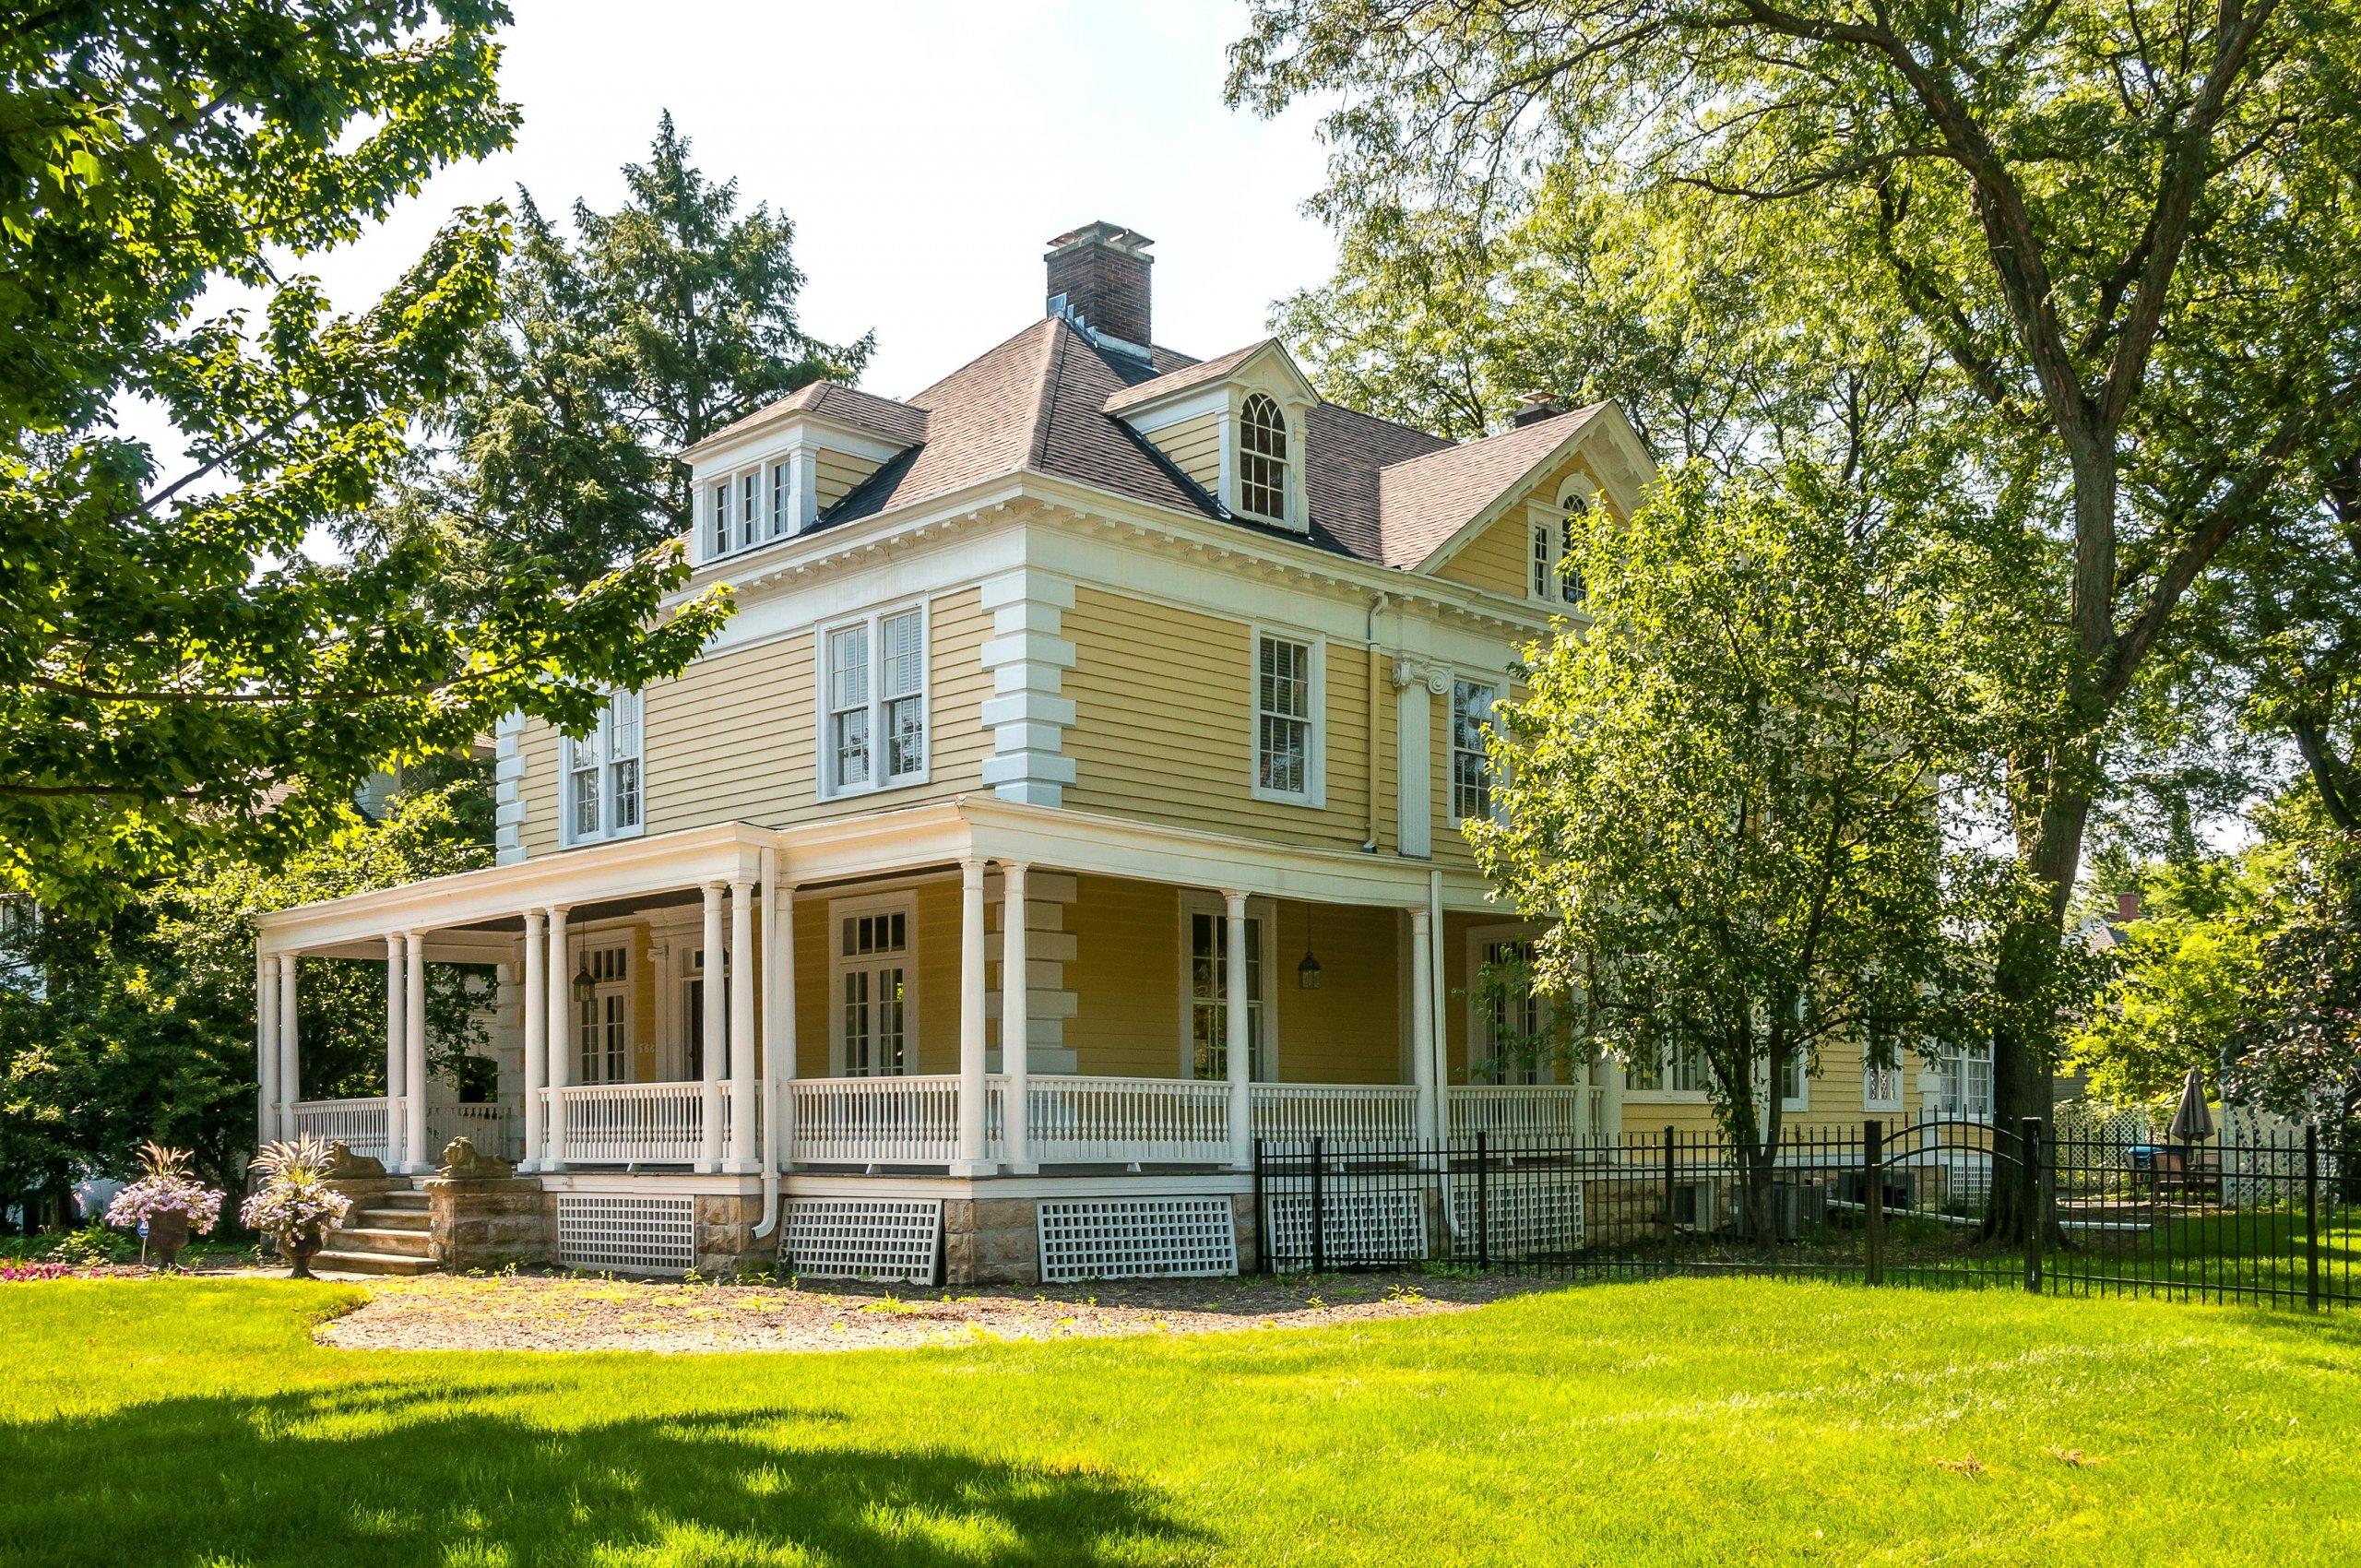 West Downer Place superb, stately Victorian mansion in Aurora, IL